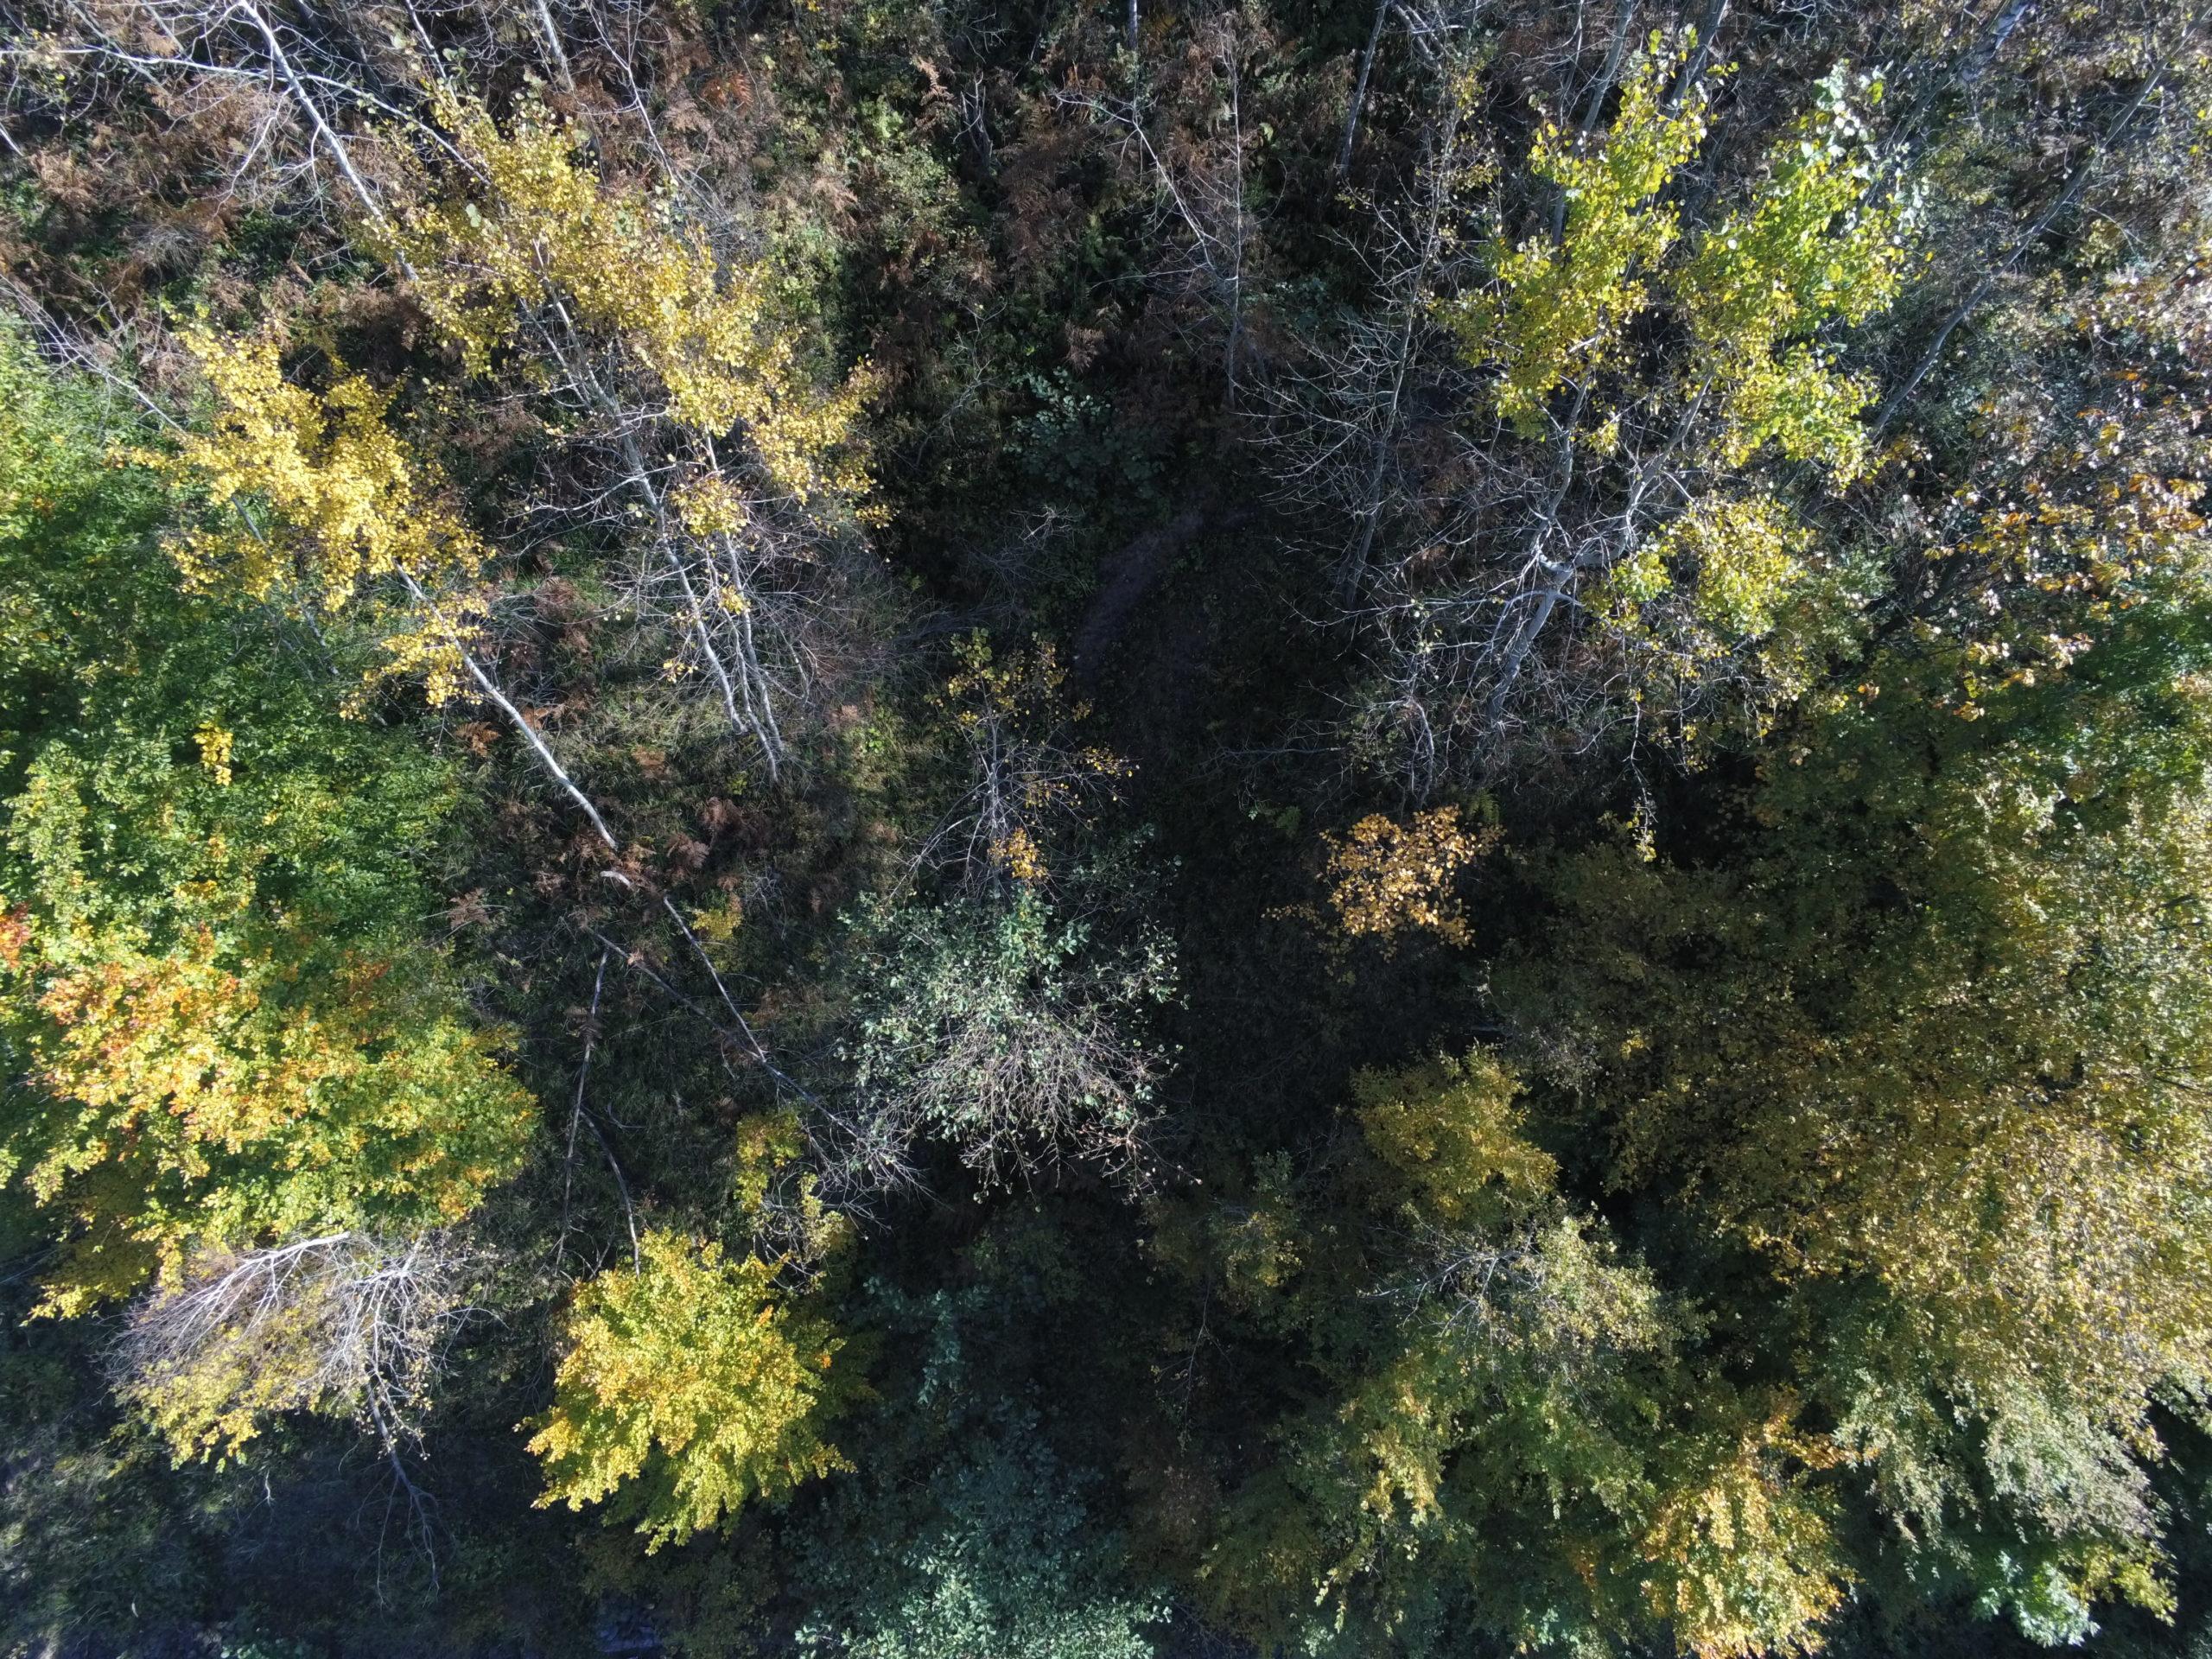 Hodzici Road 7 - Drone